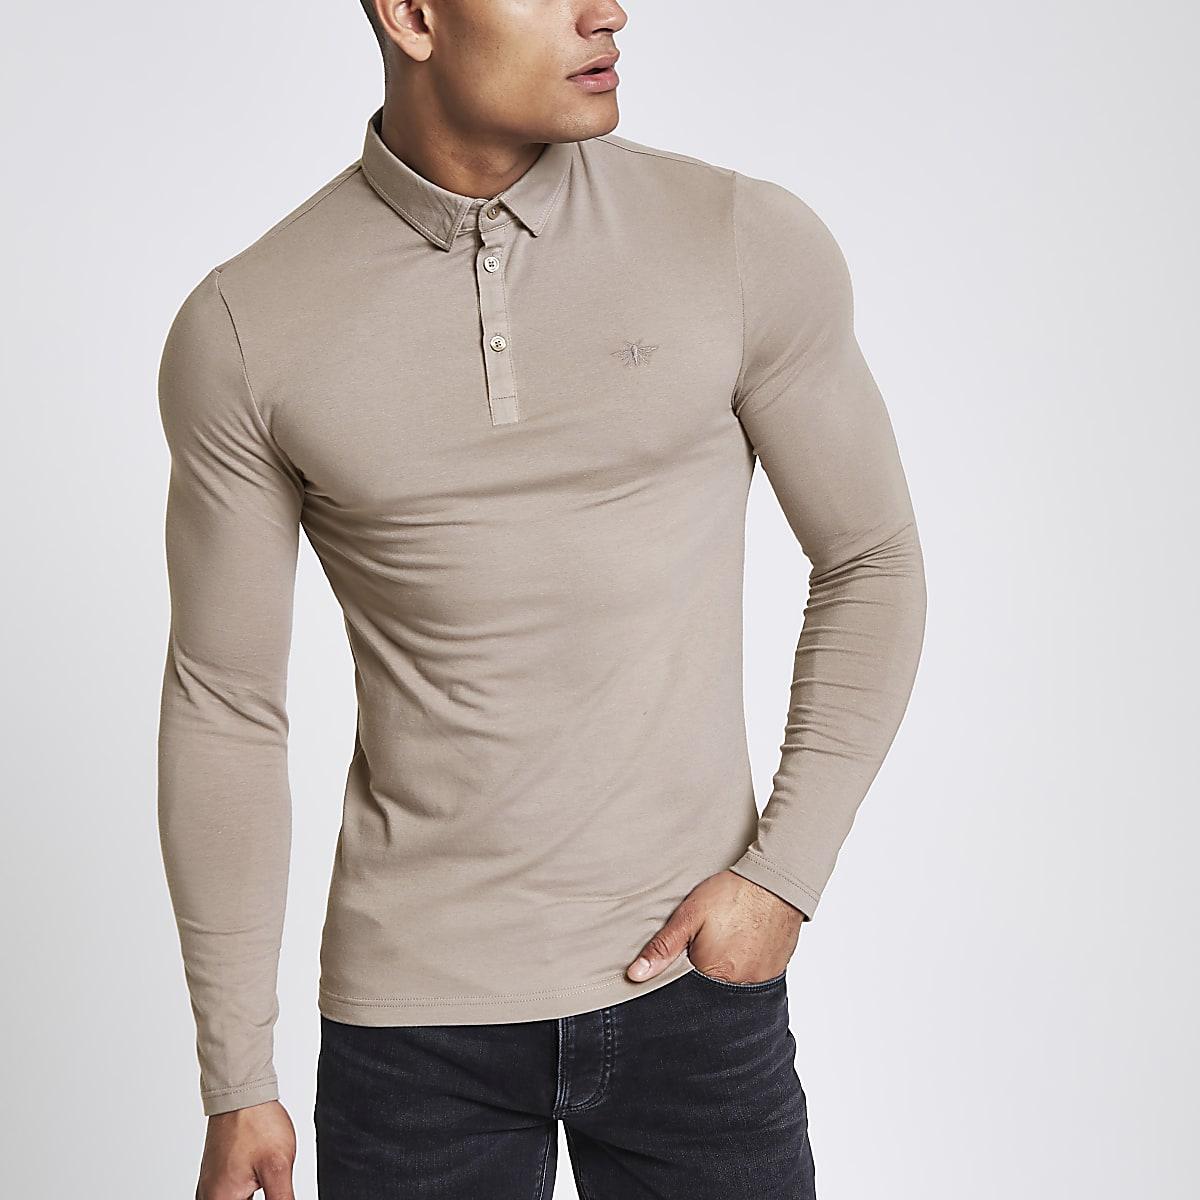 a8b8166ef Light brown muscle fit long sleeve polo shirt - Polo Shirts - men